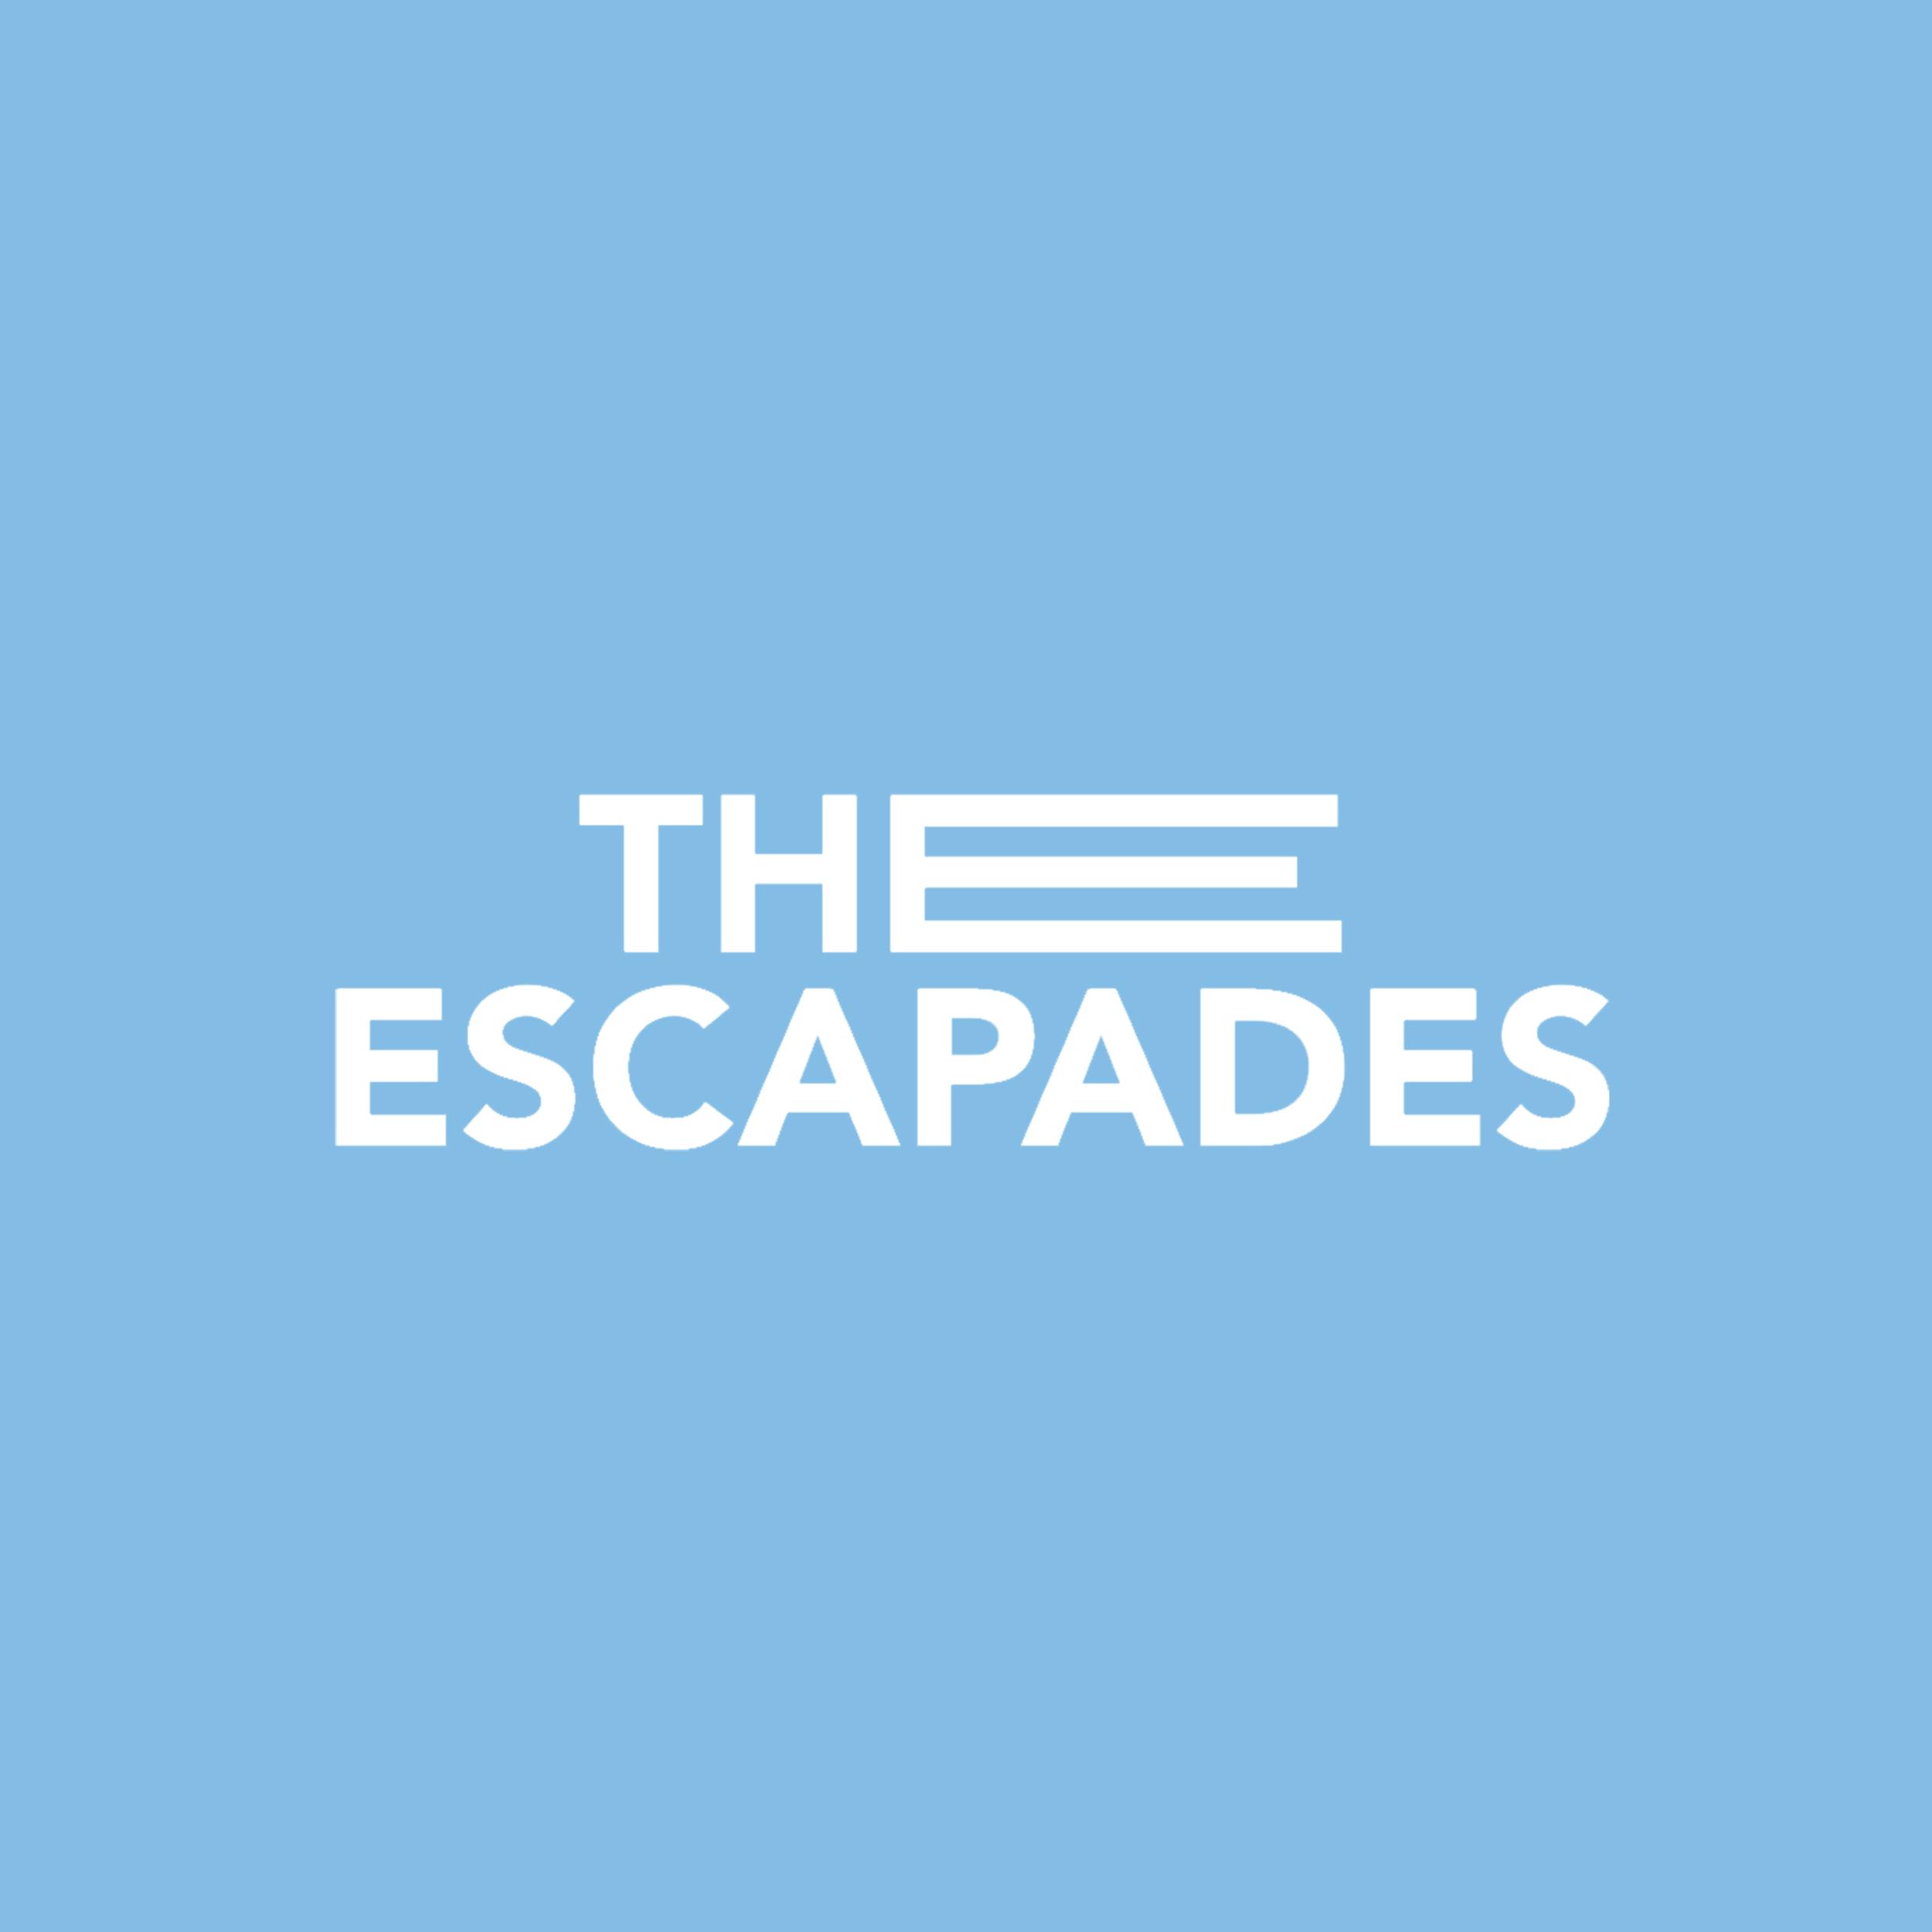 Photo Courtesy of The Escapades